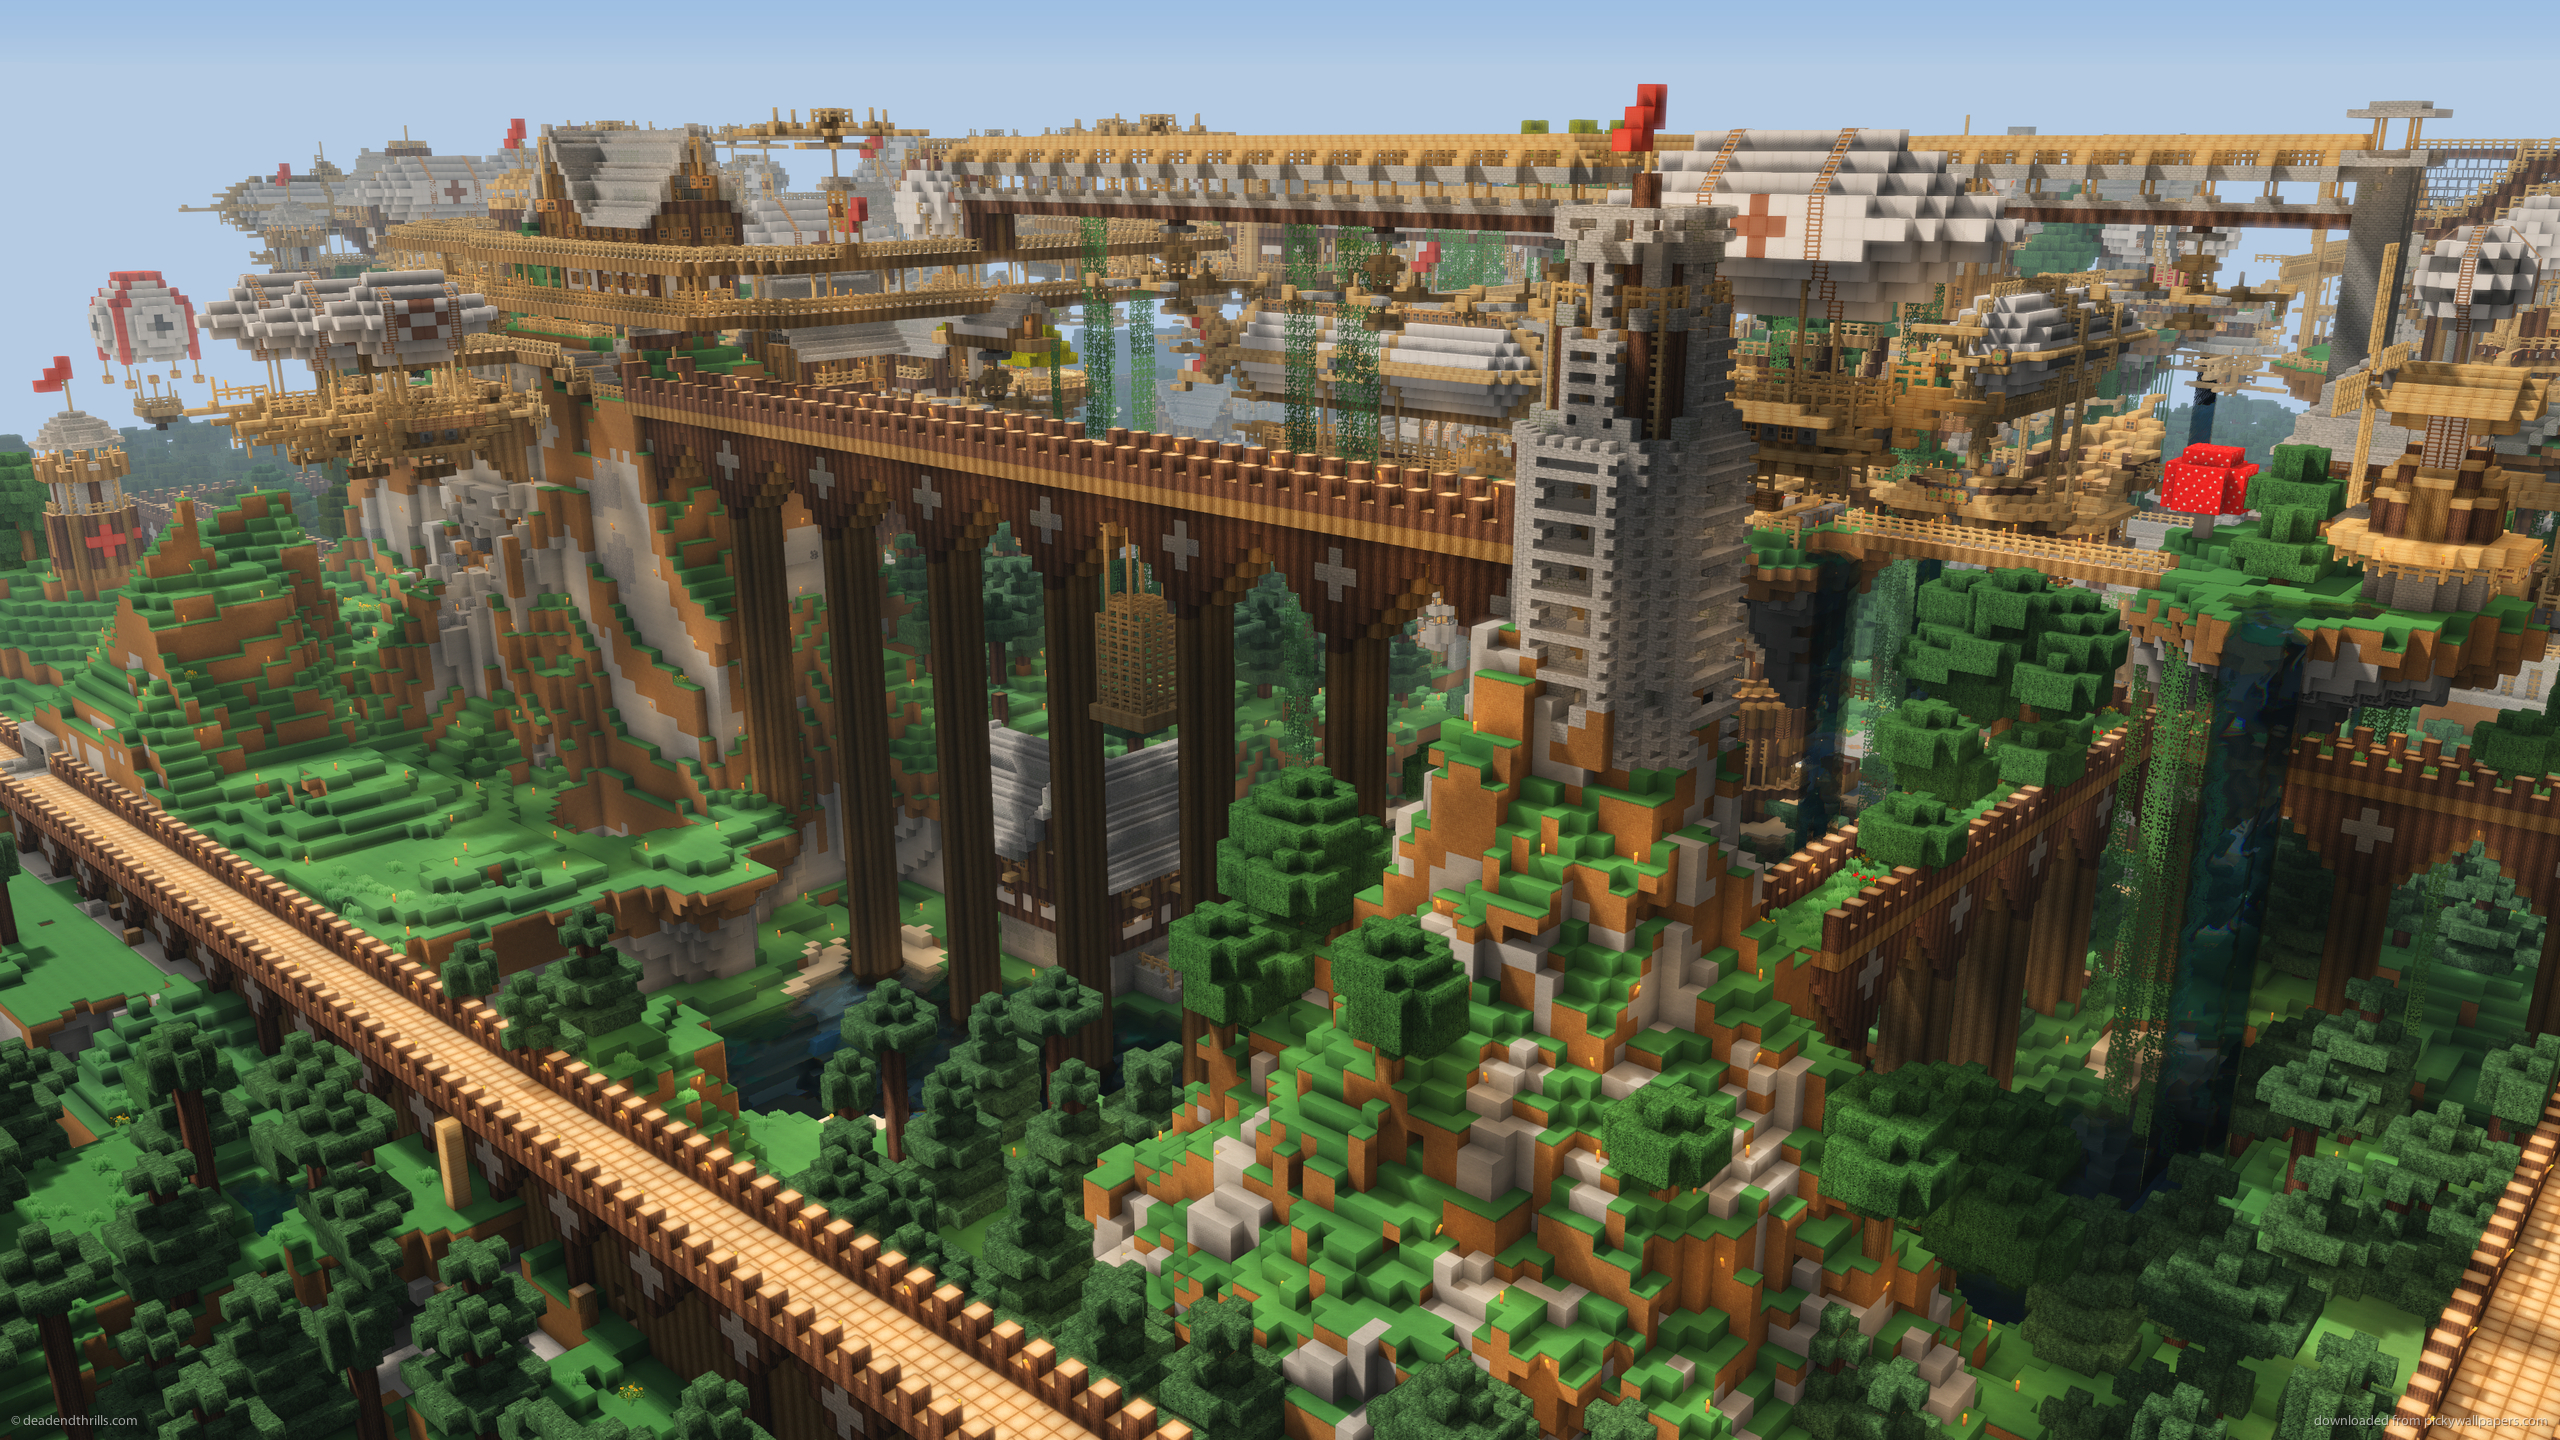 Download 2560x1440 Minecraft Dockland Wallpaper 2560x1440